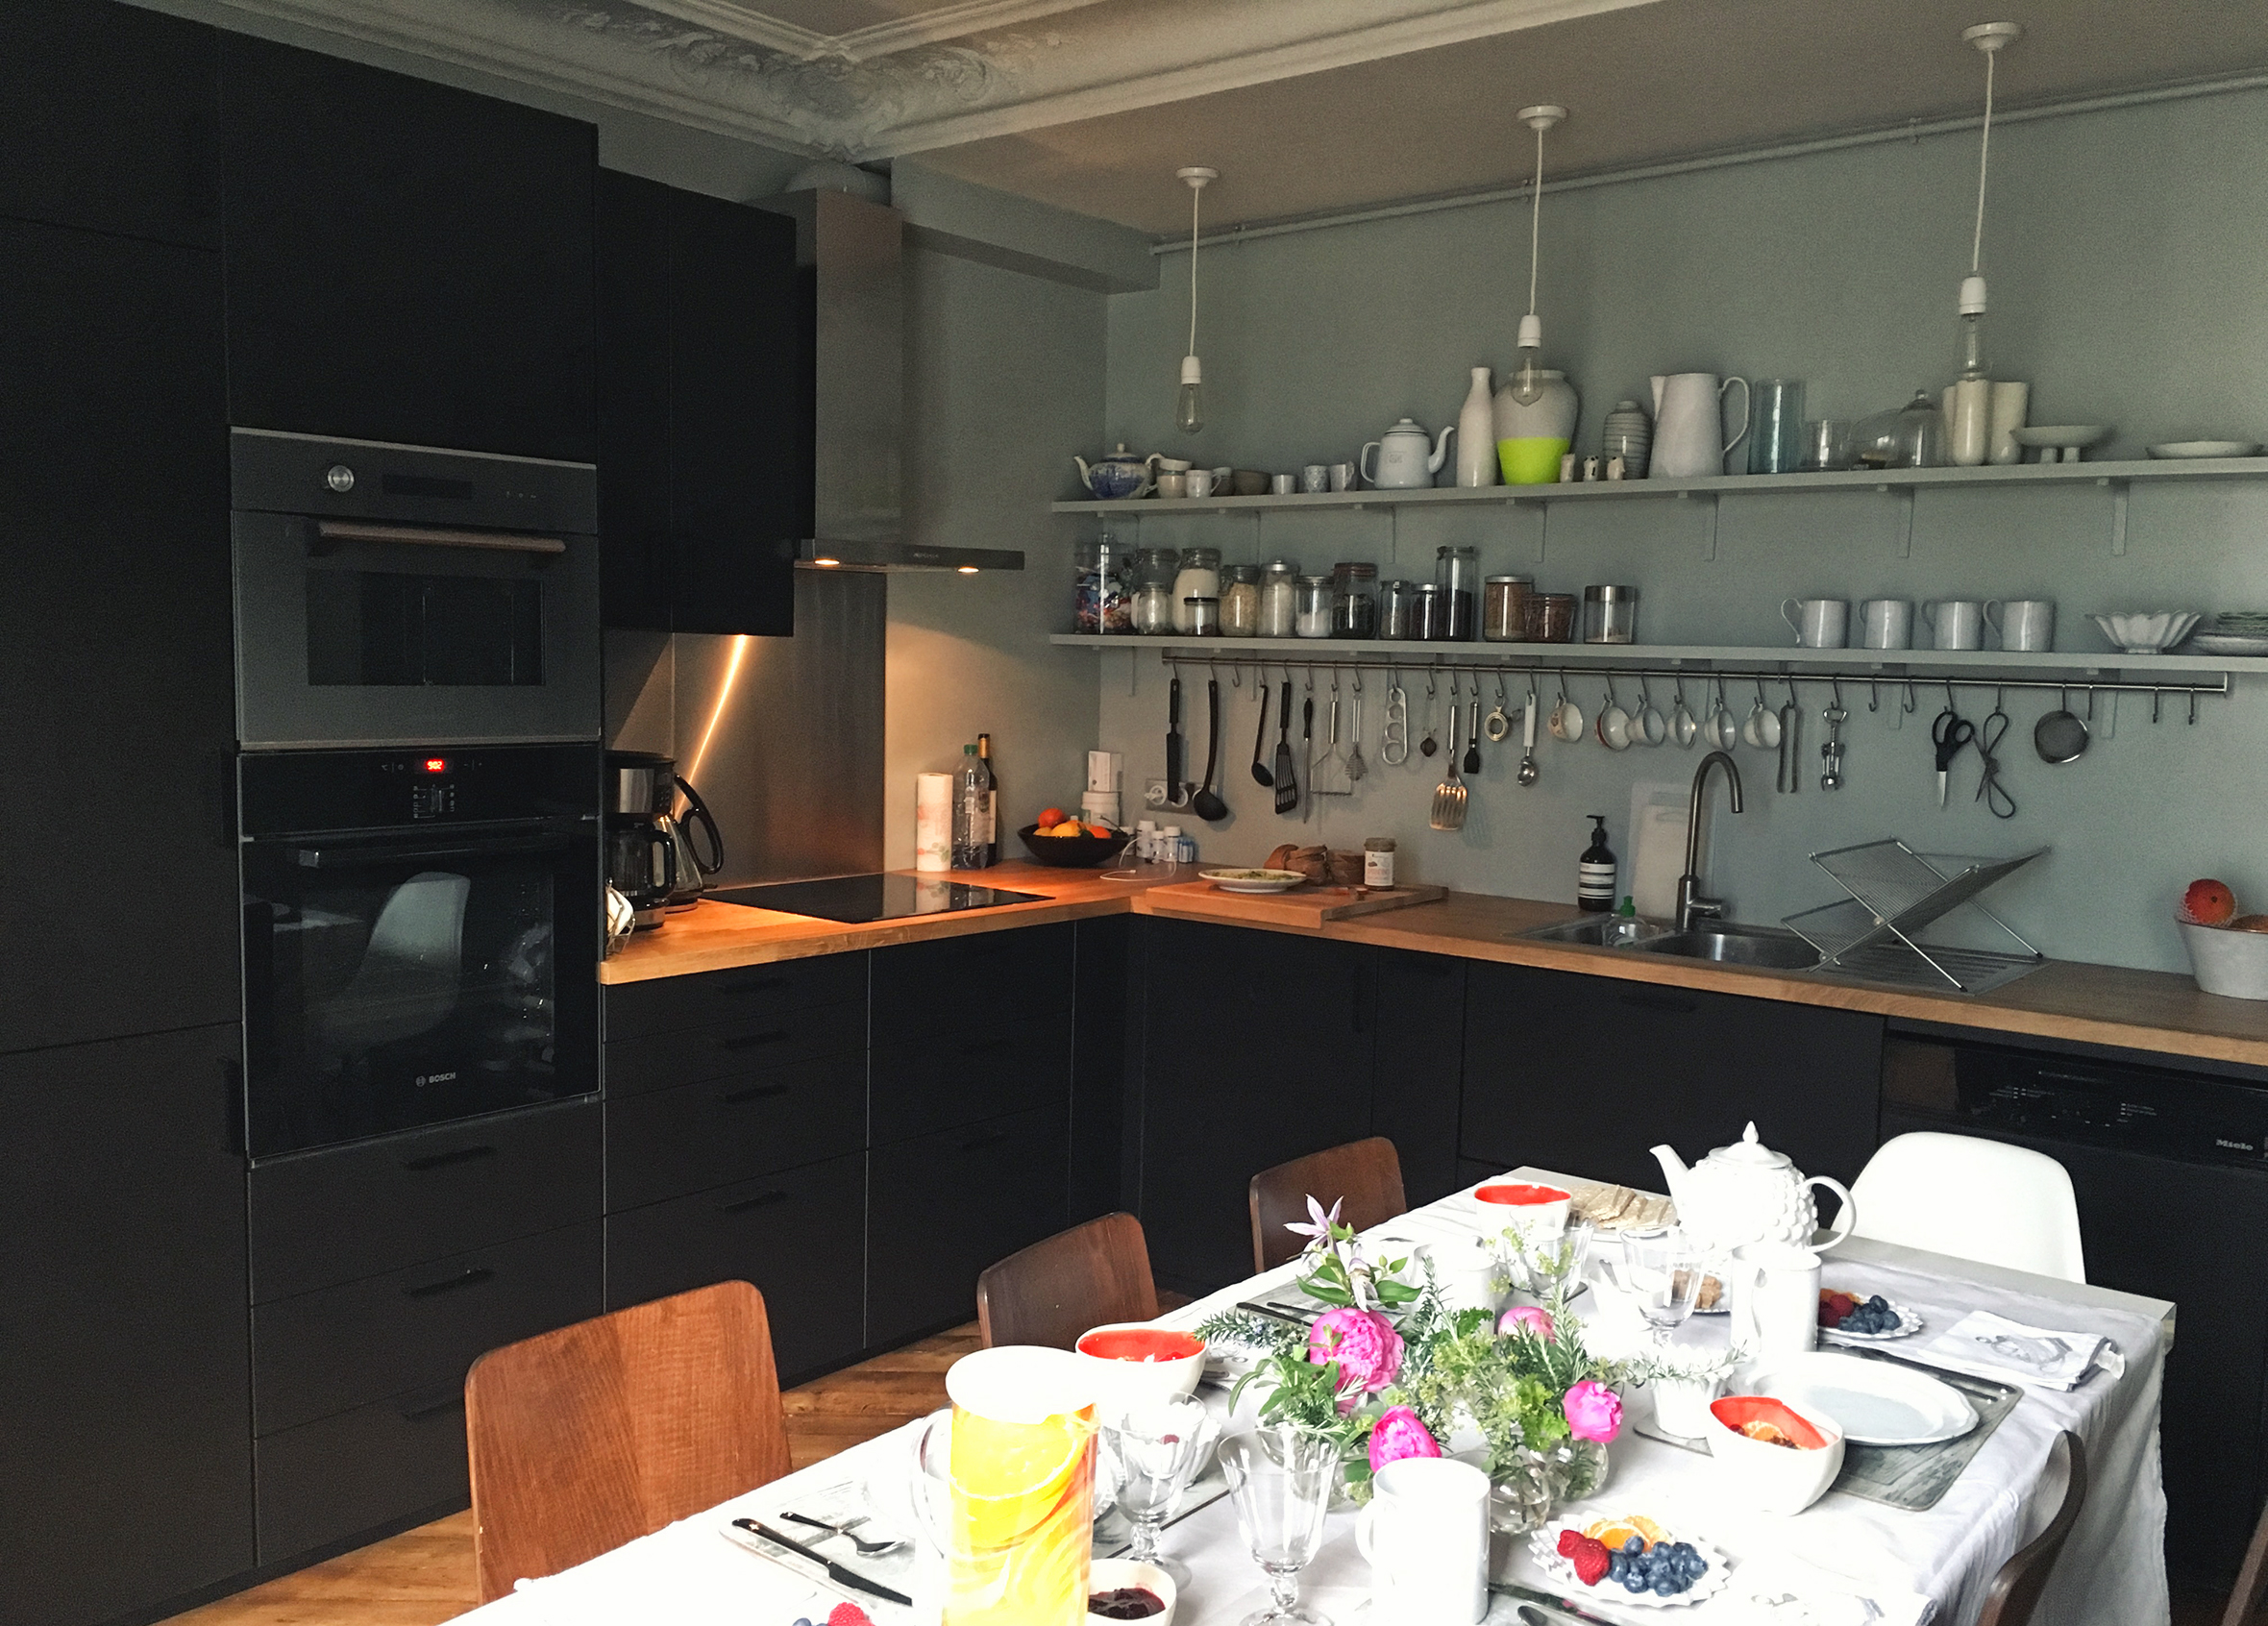 Porte Cuisine Sur Mesure Ikea comment personnaliser sa cuisine ikea? - lili barbery